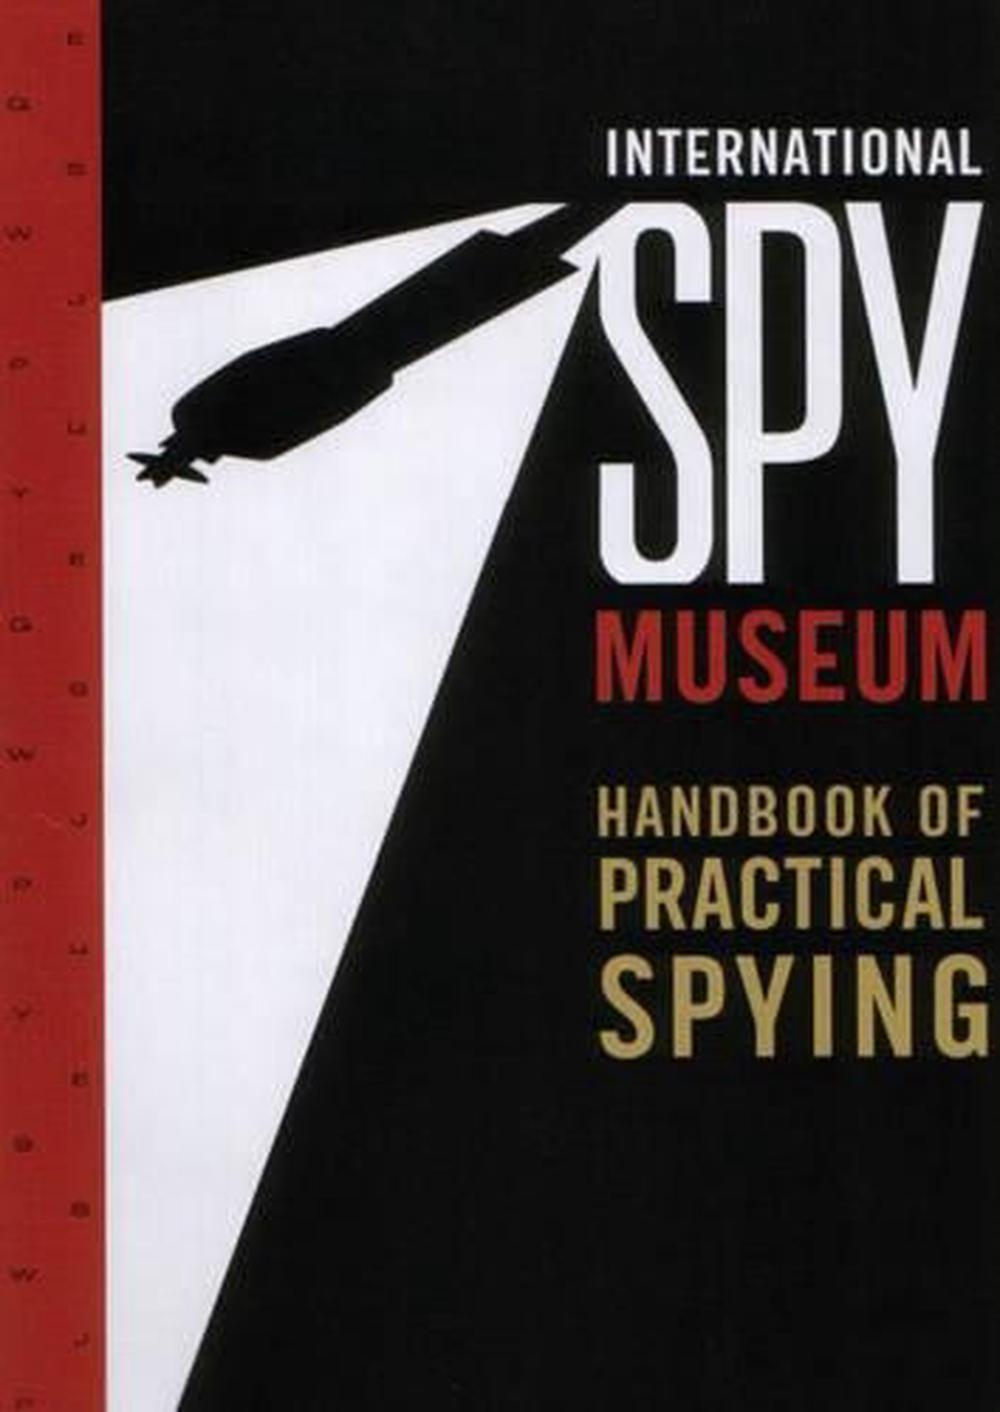 The Handbook of Practical Spying